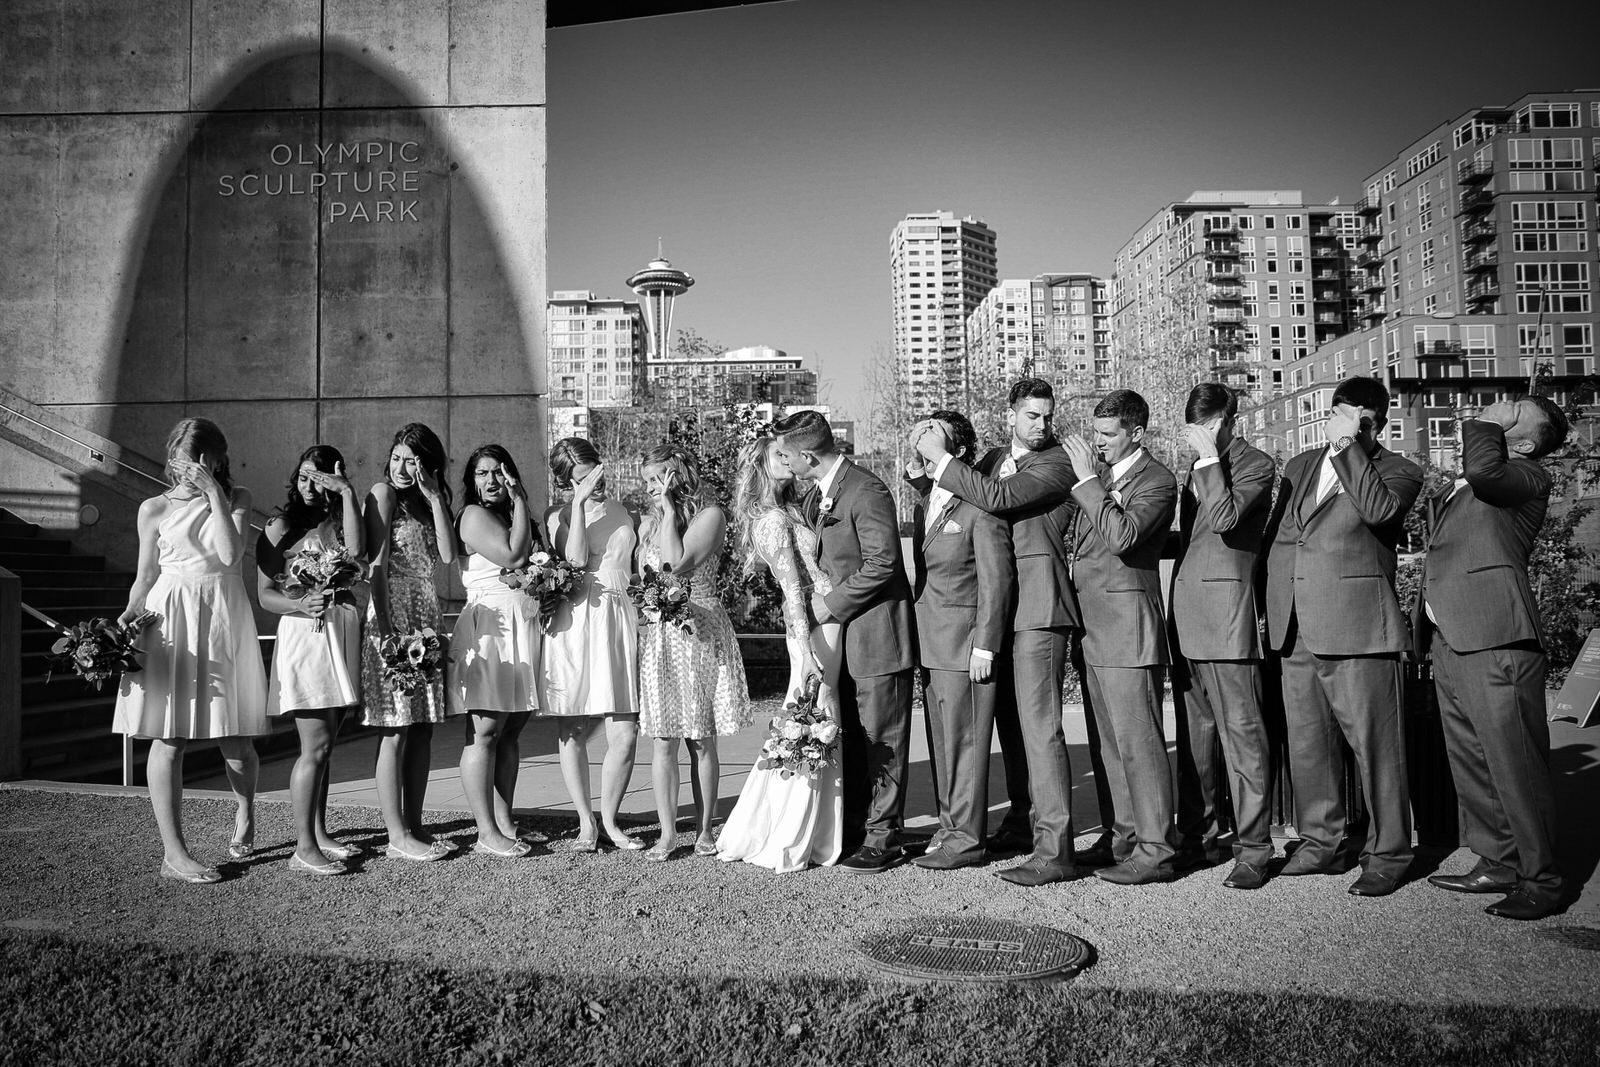 Wedding Photo Sculpture Park Seattle